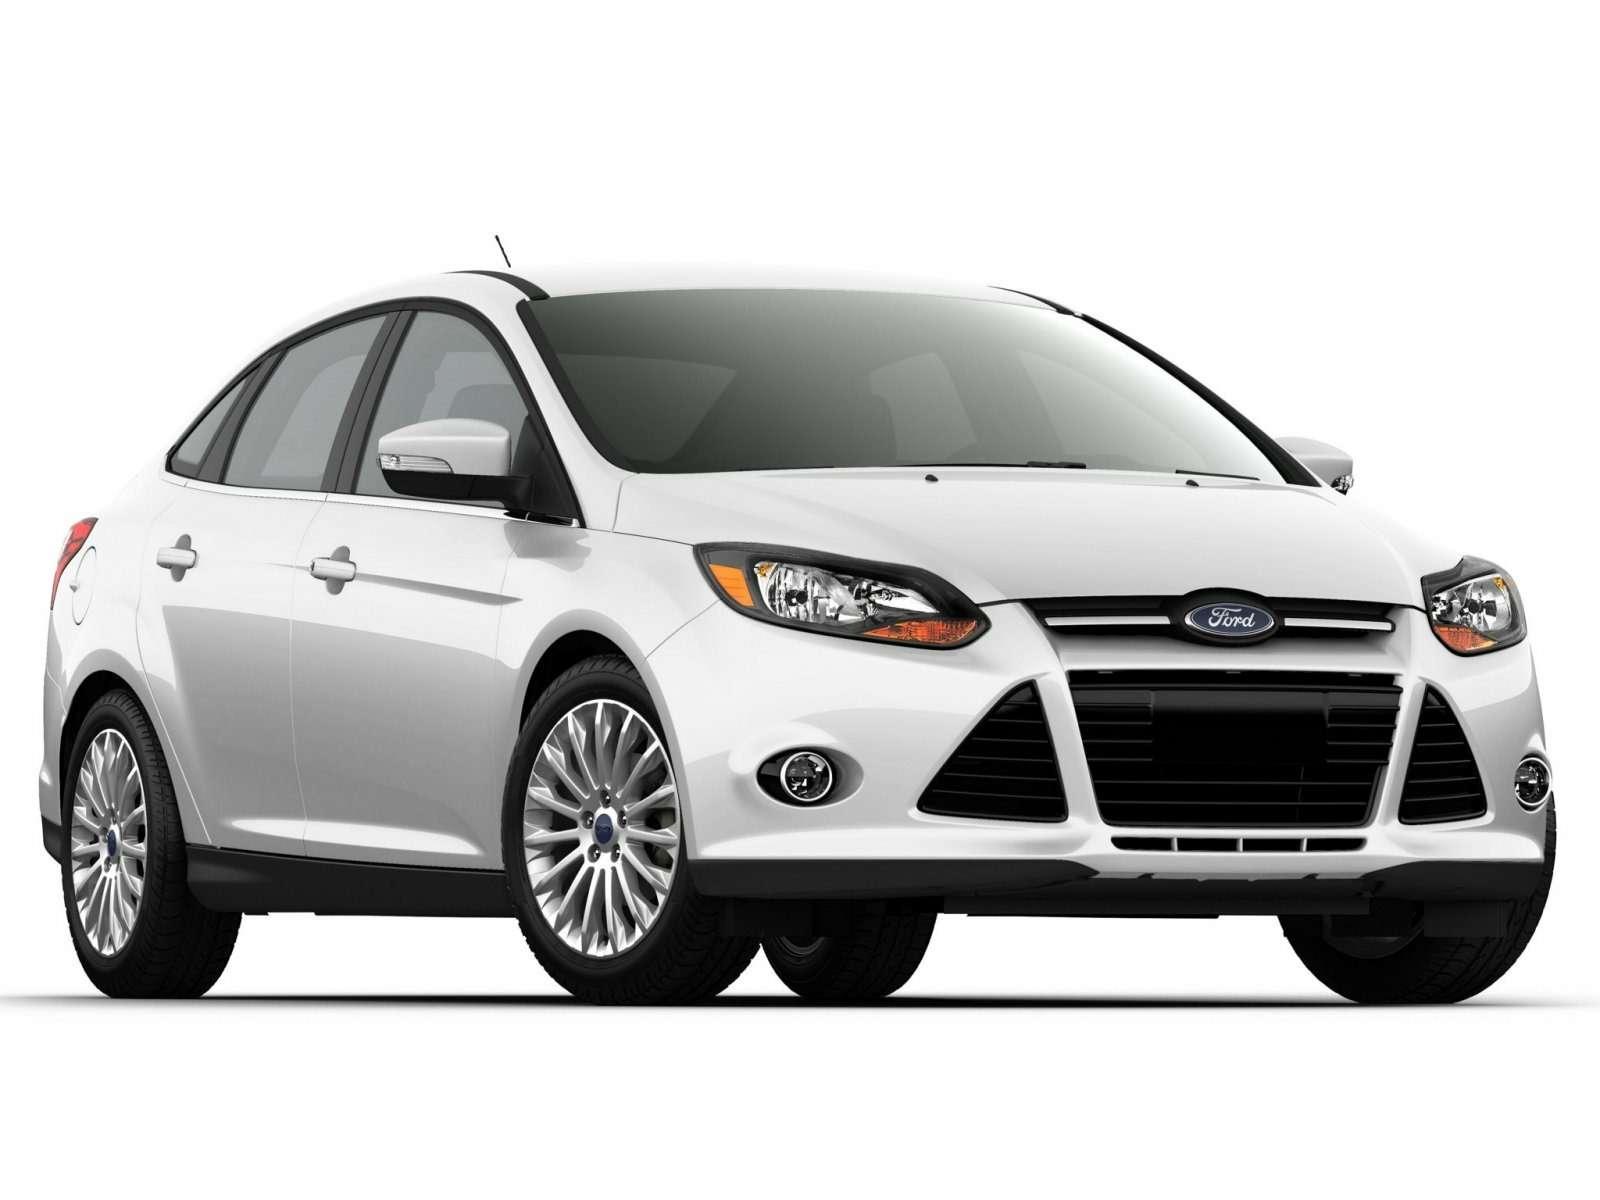 Ford_Focus_Sedan_2010